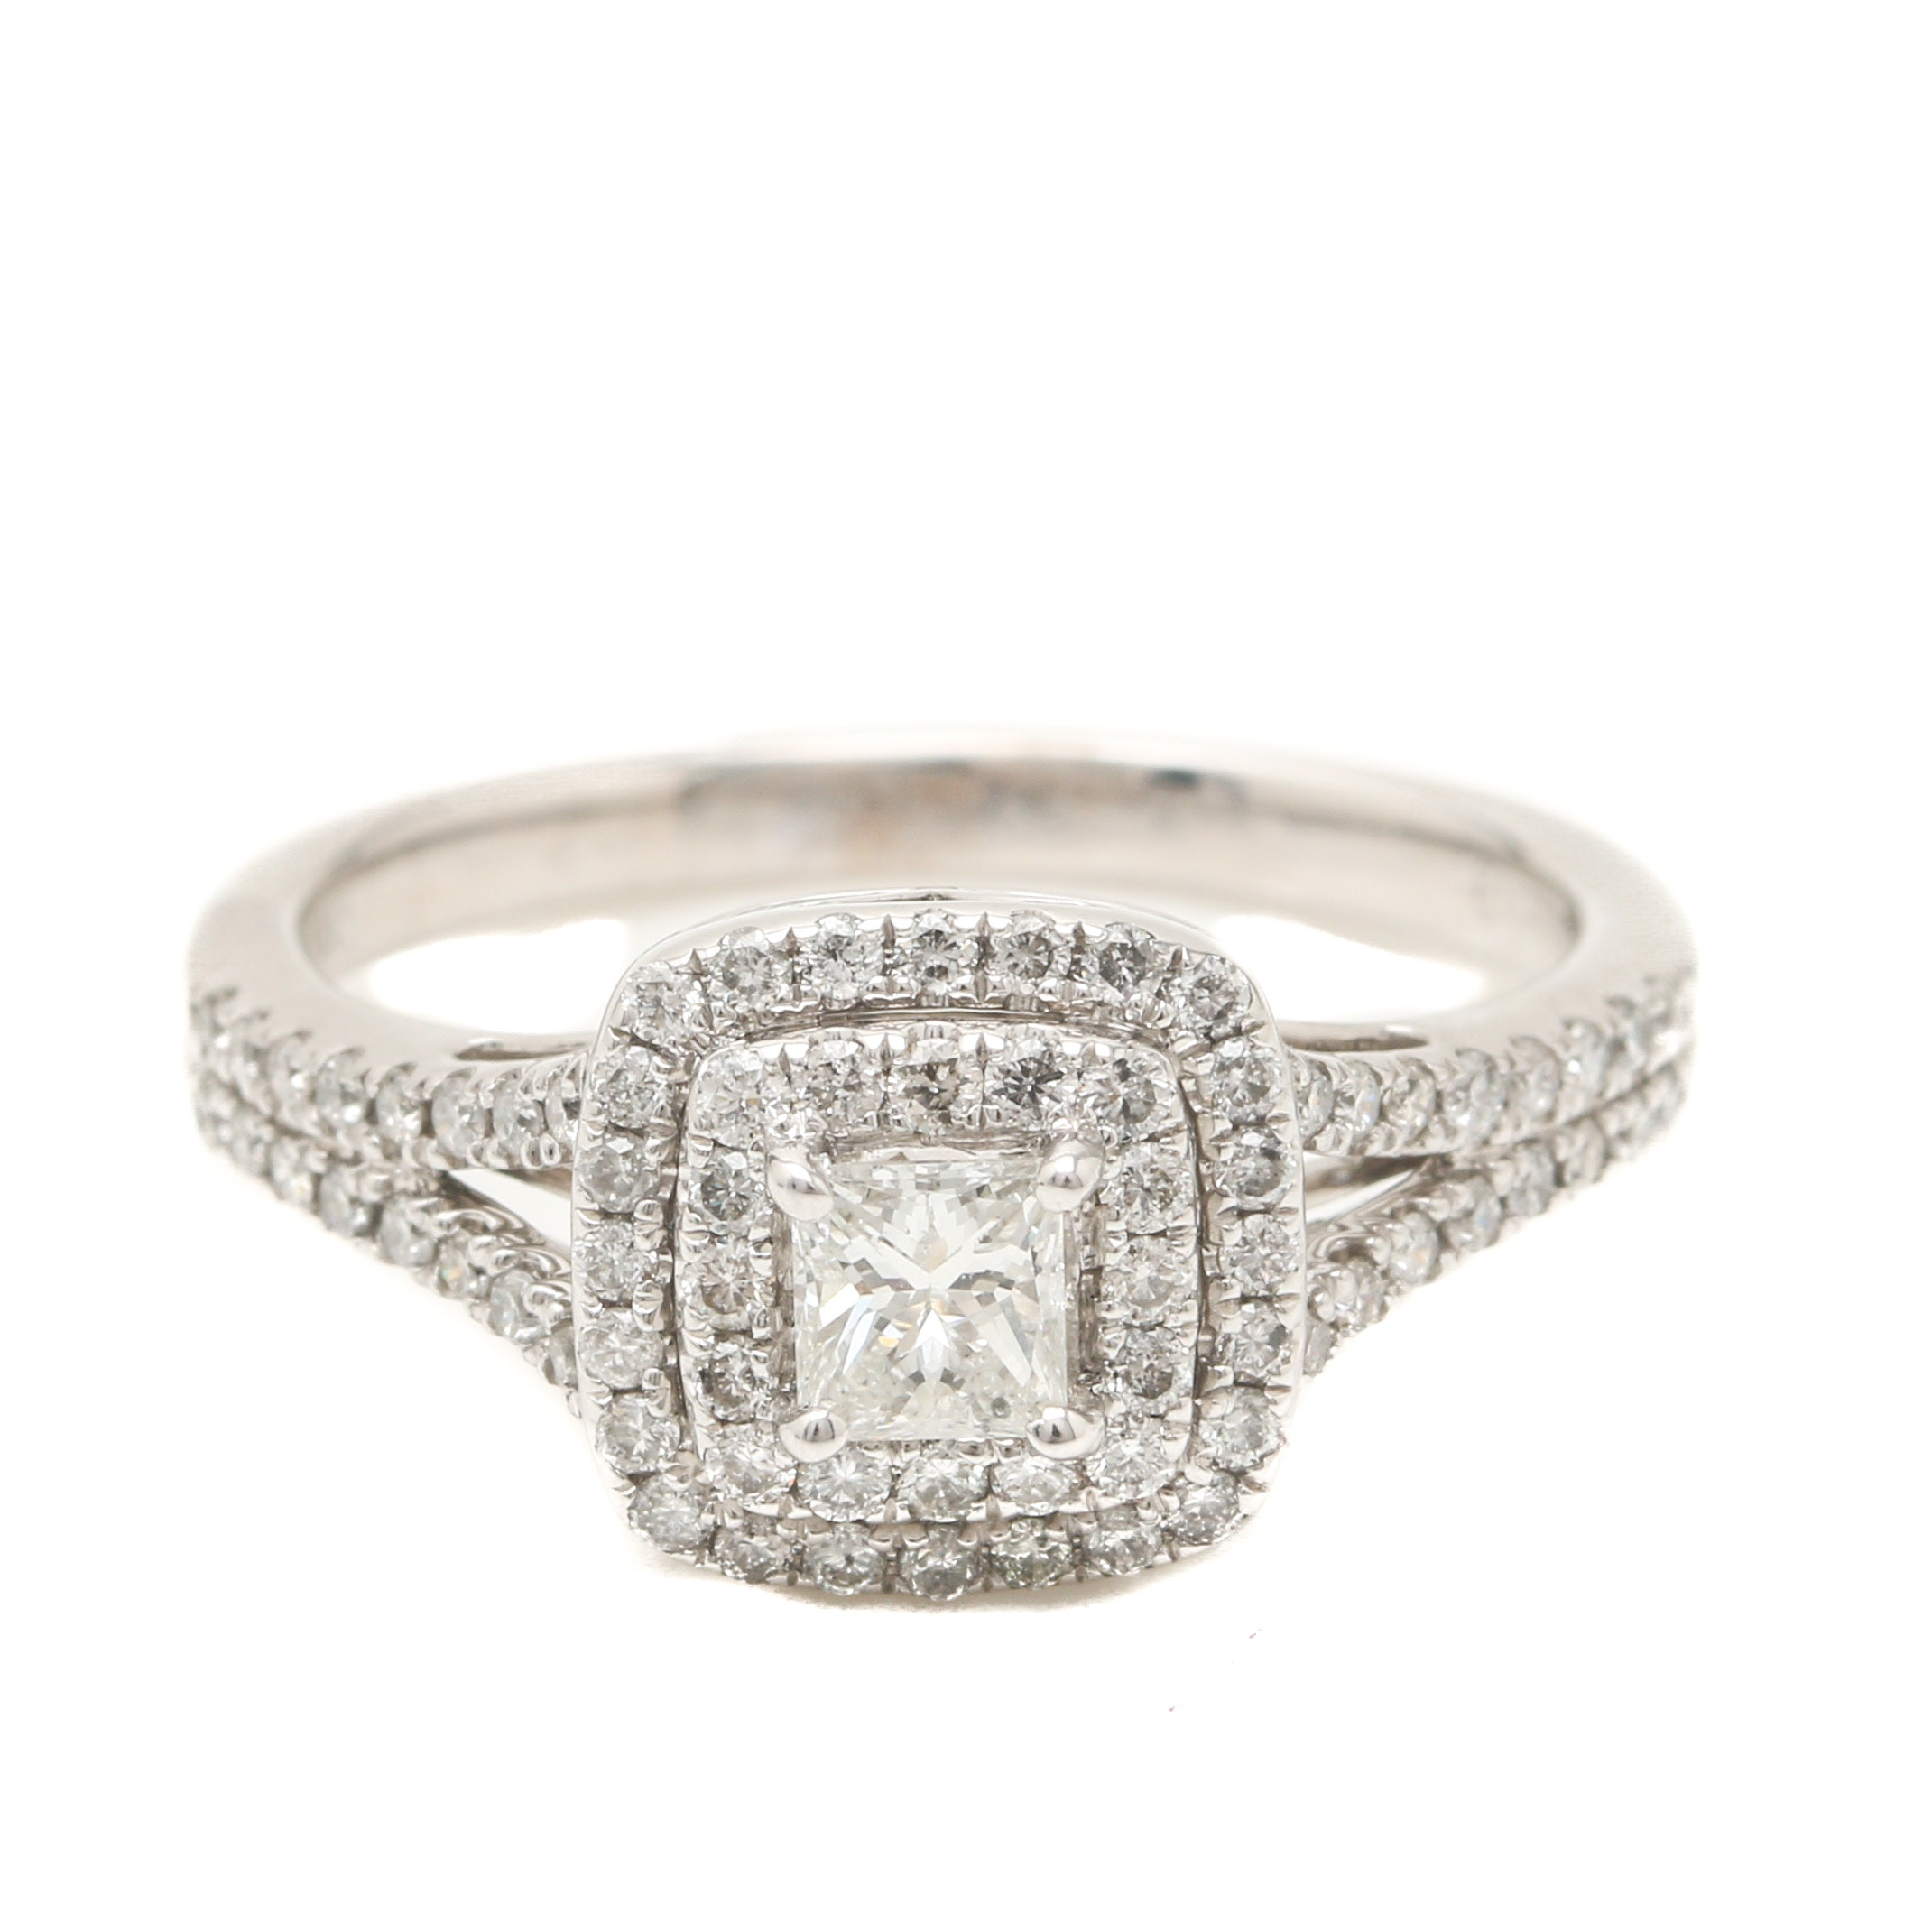 14K White Gold 1.04 CTW Diamond Ring